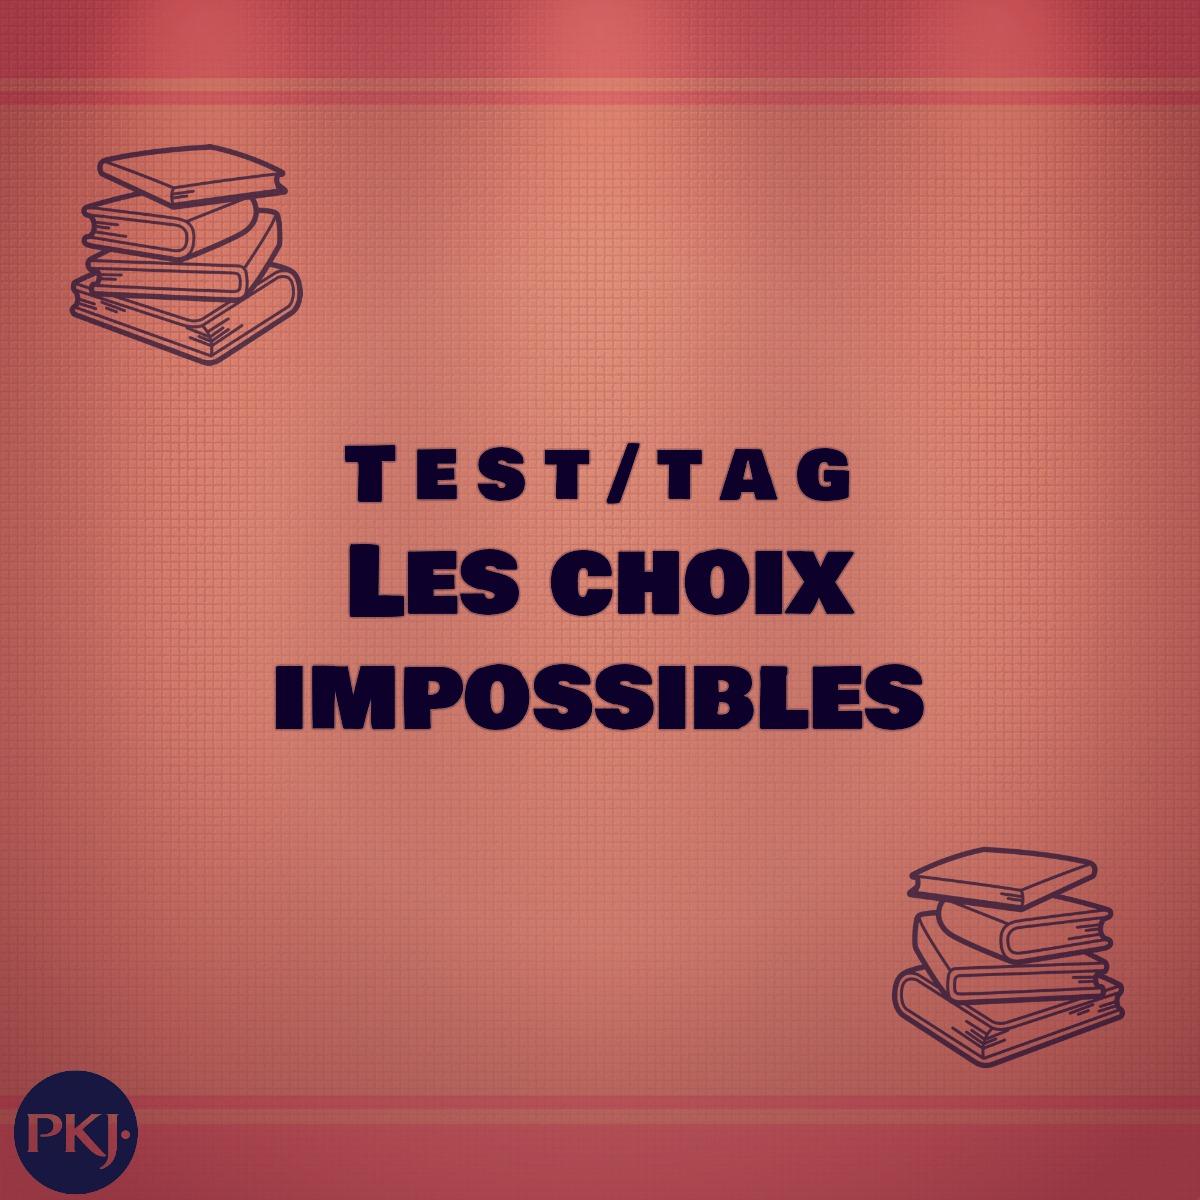 Tag pkj choix impossibles 1